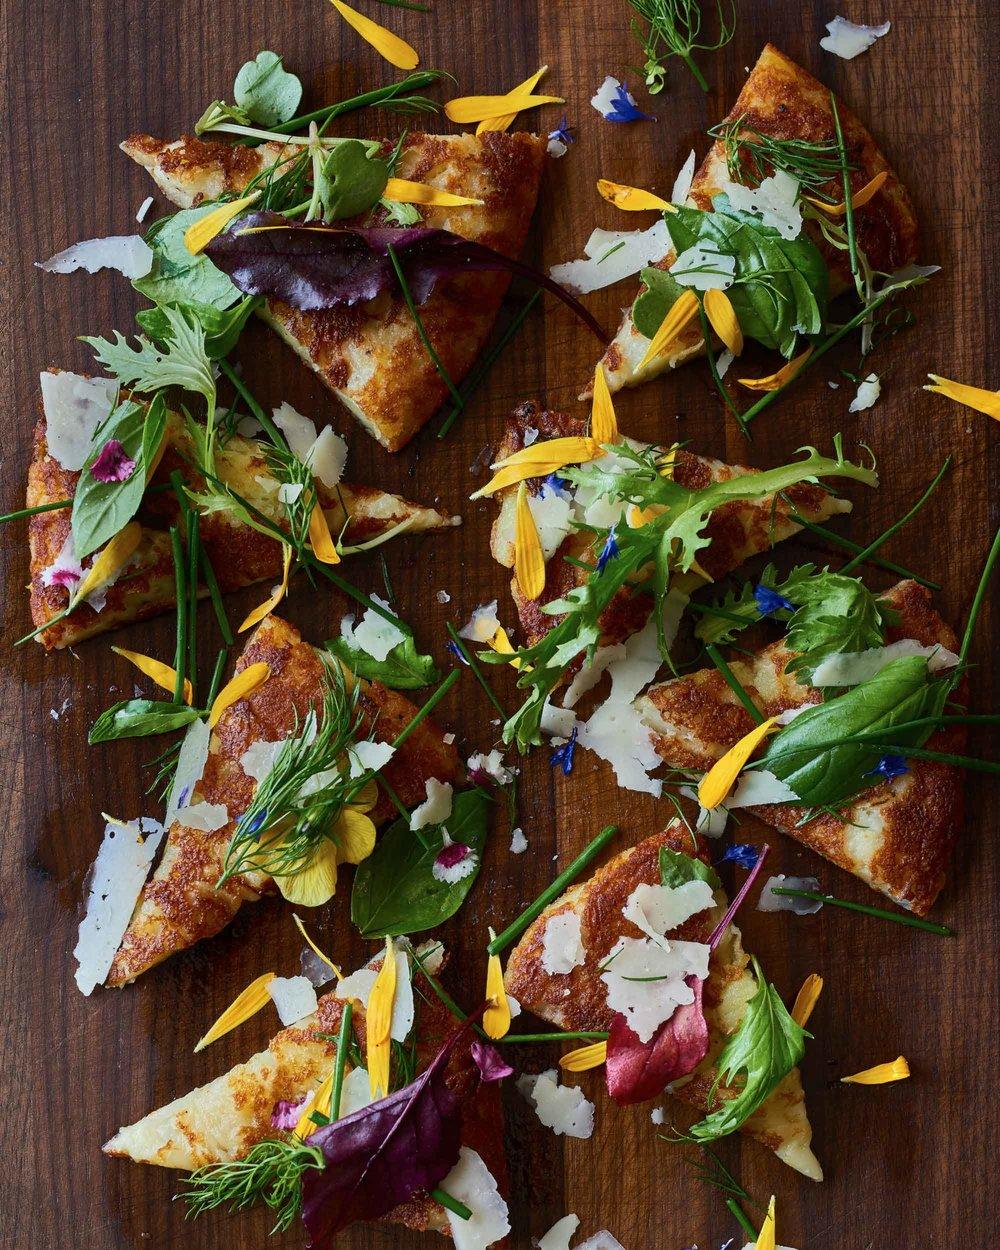 Fried-Potato-and-Cheese-Pancake_20.jpg